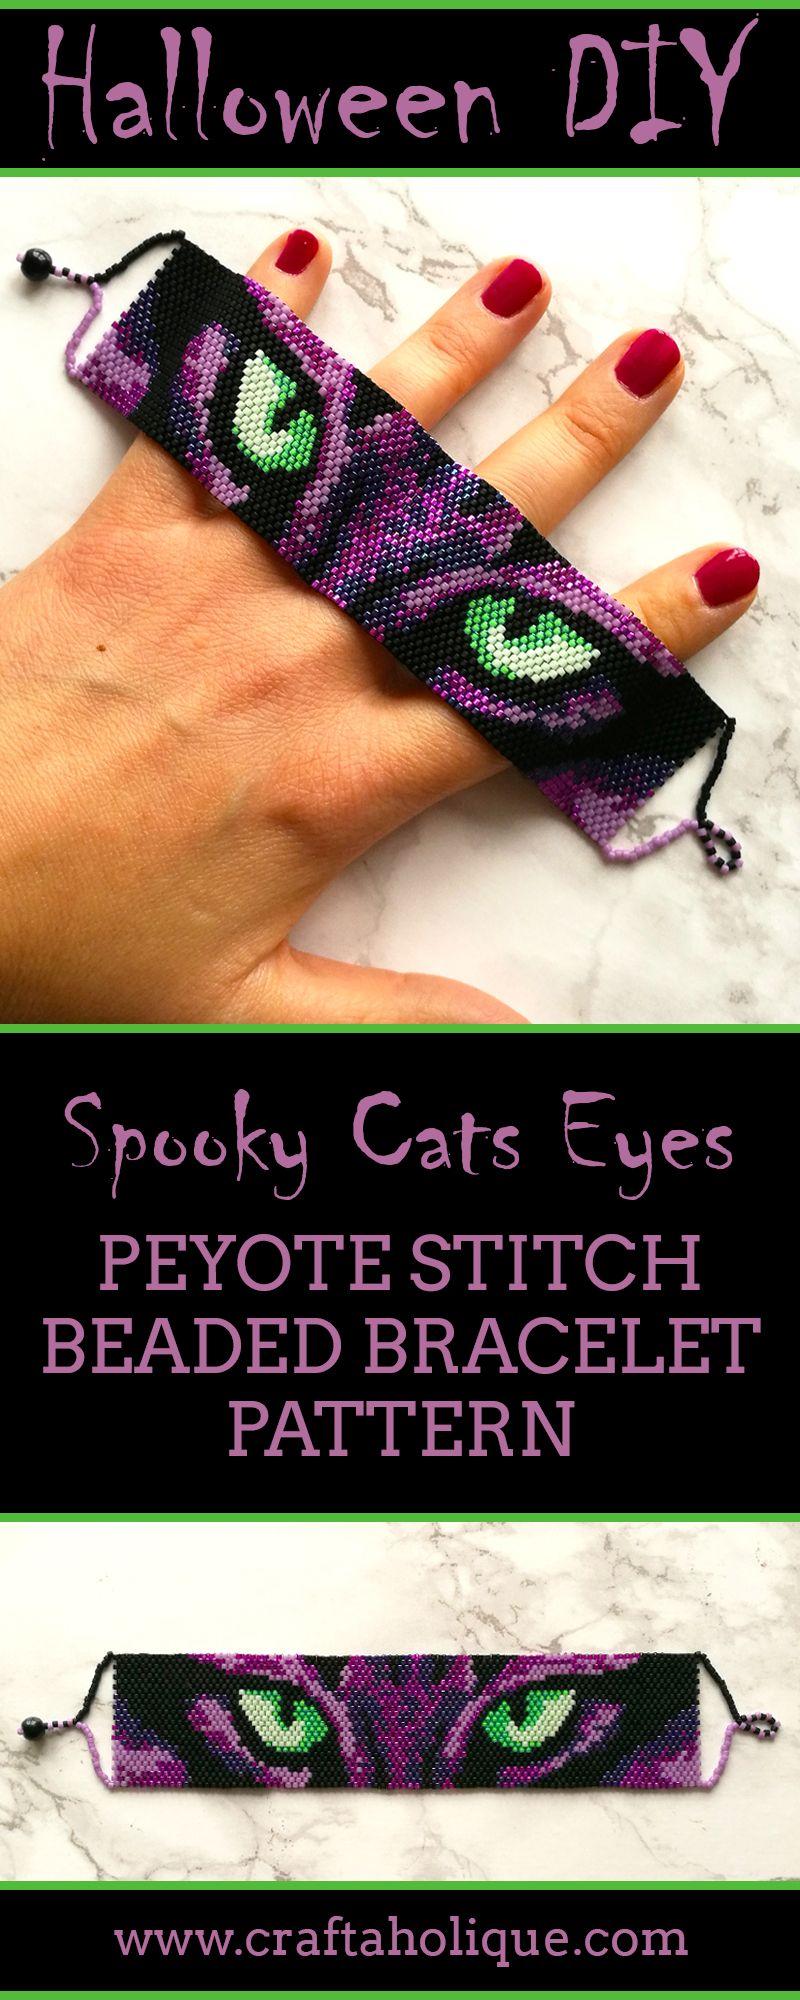 Halloween Peyote Stitch Pattern - Spooky Cats Eyes #halloween